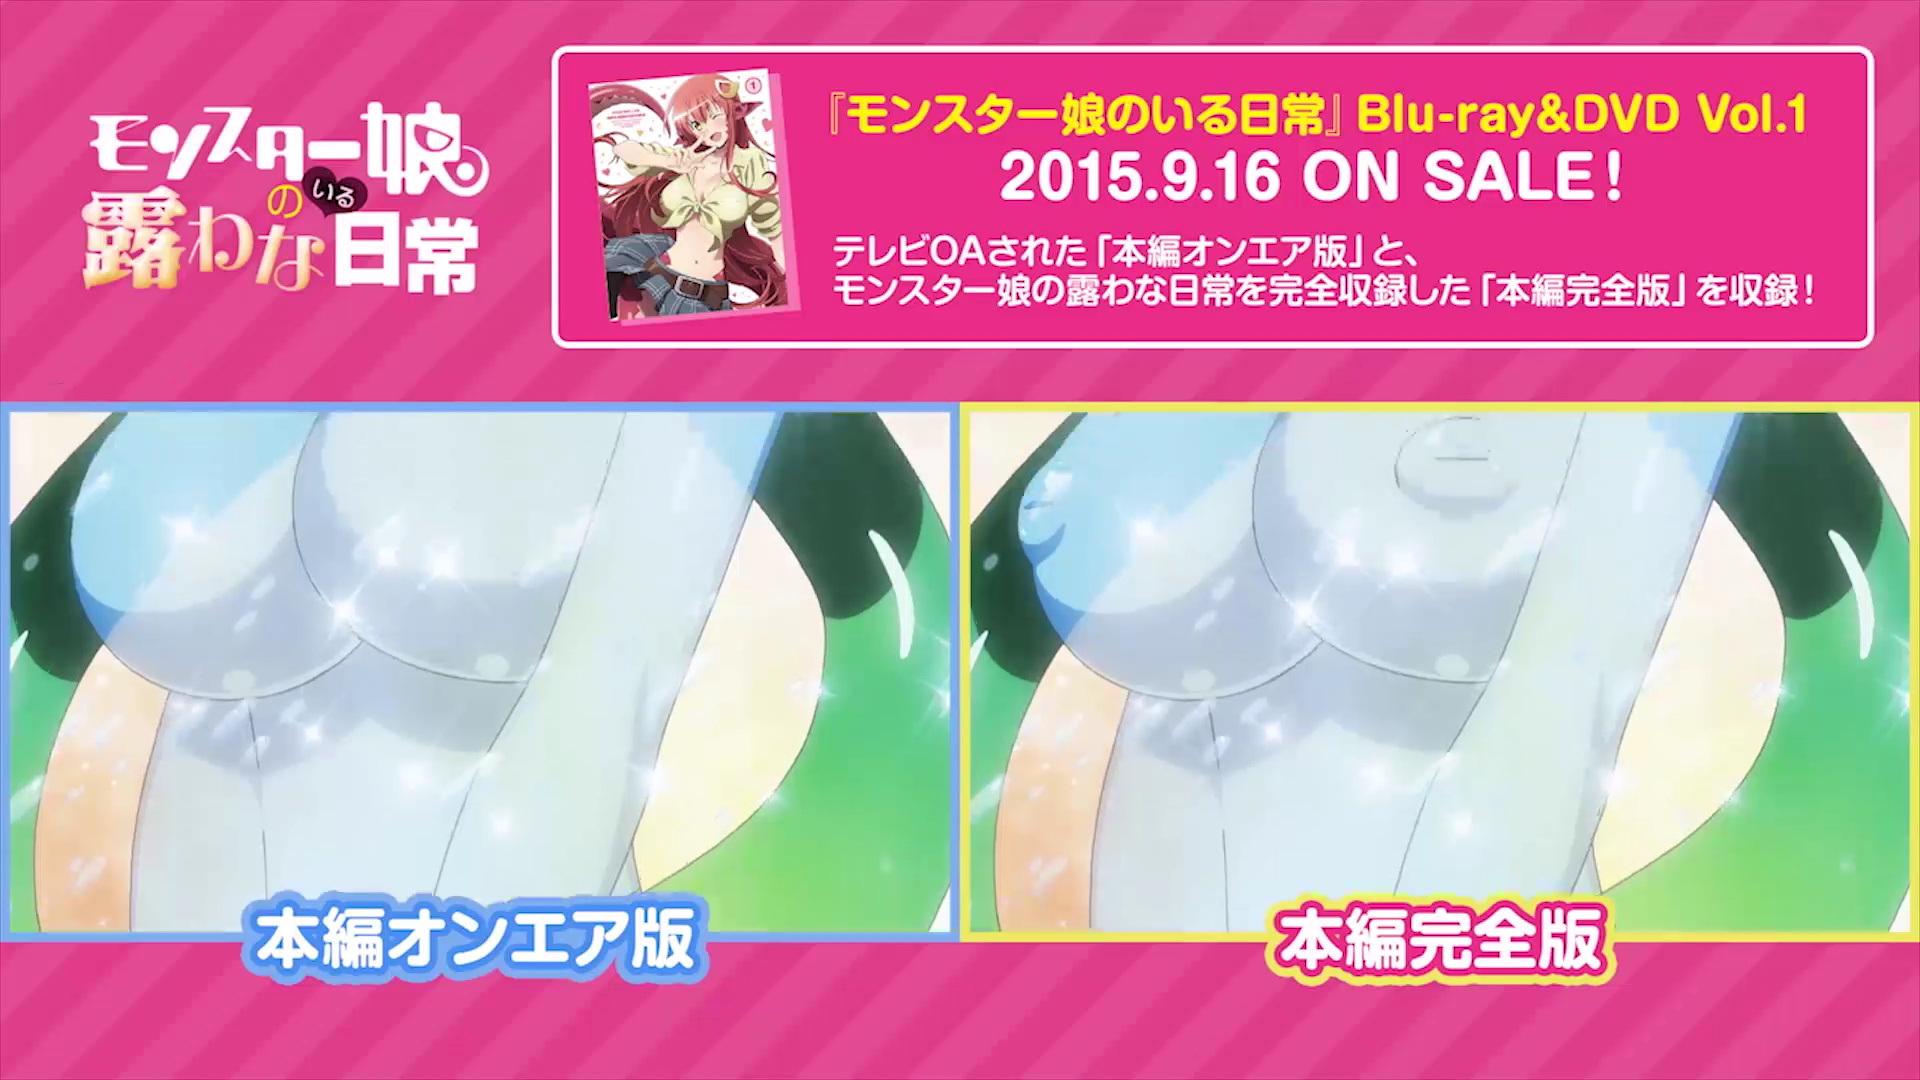 TV vs Blu-Ray Monster Musume anime blu-ray volume 1 uncensored 7